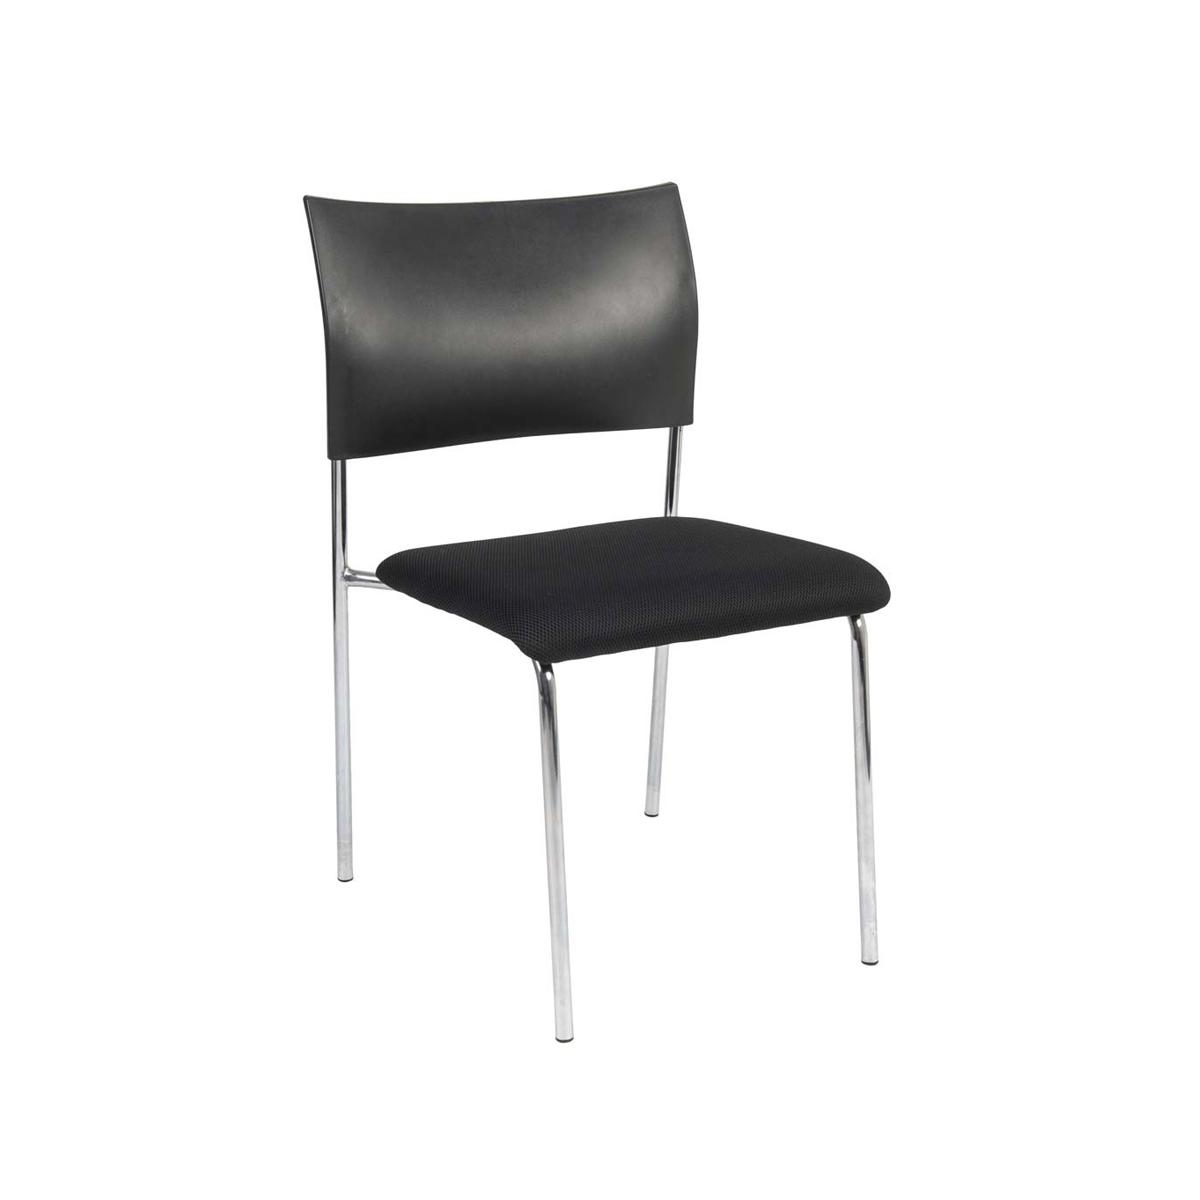 Commercial furniture cam interiors darwin 39 s leading for Commercial furniture